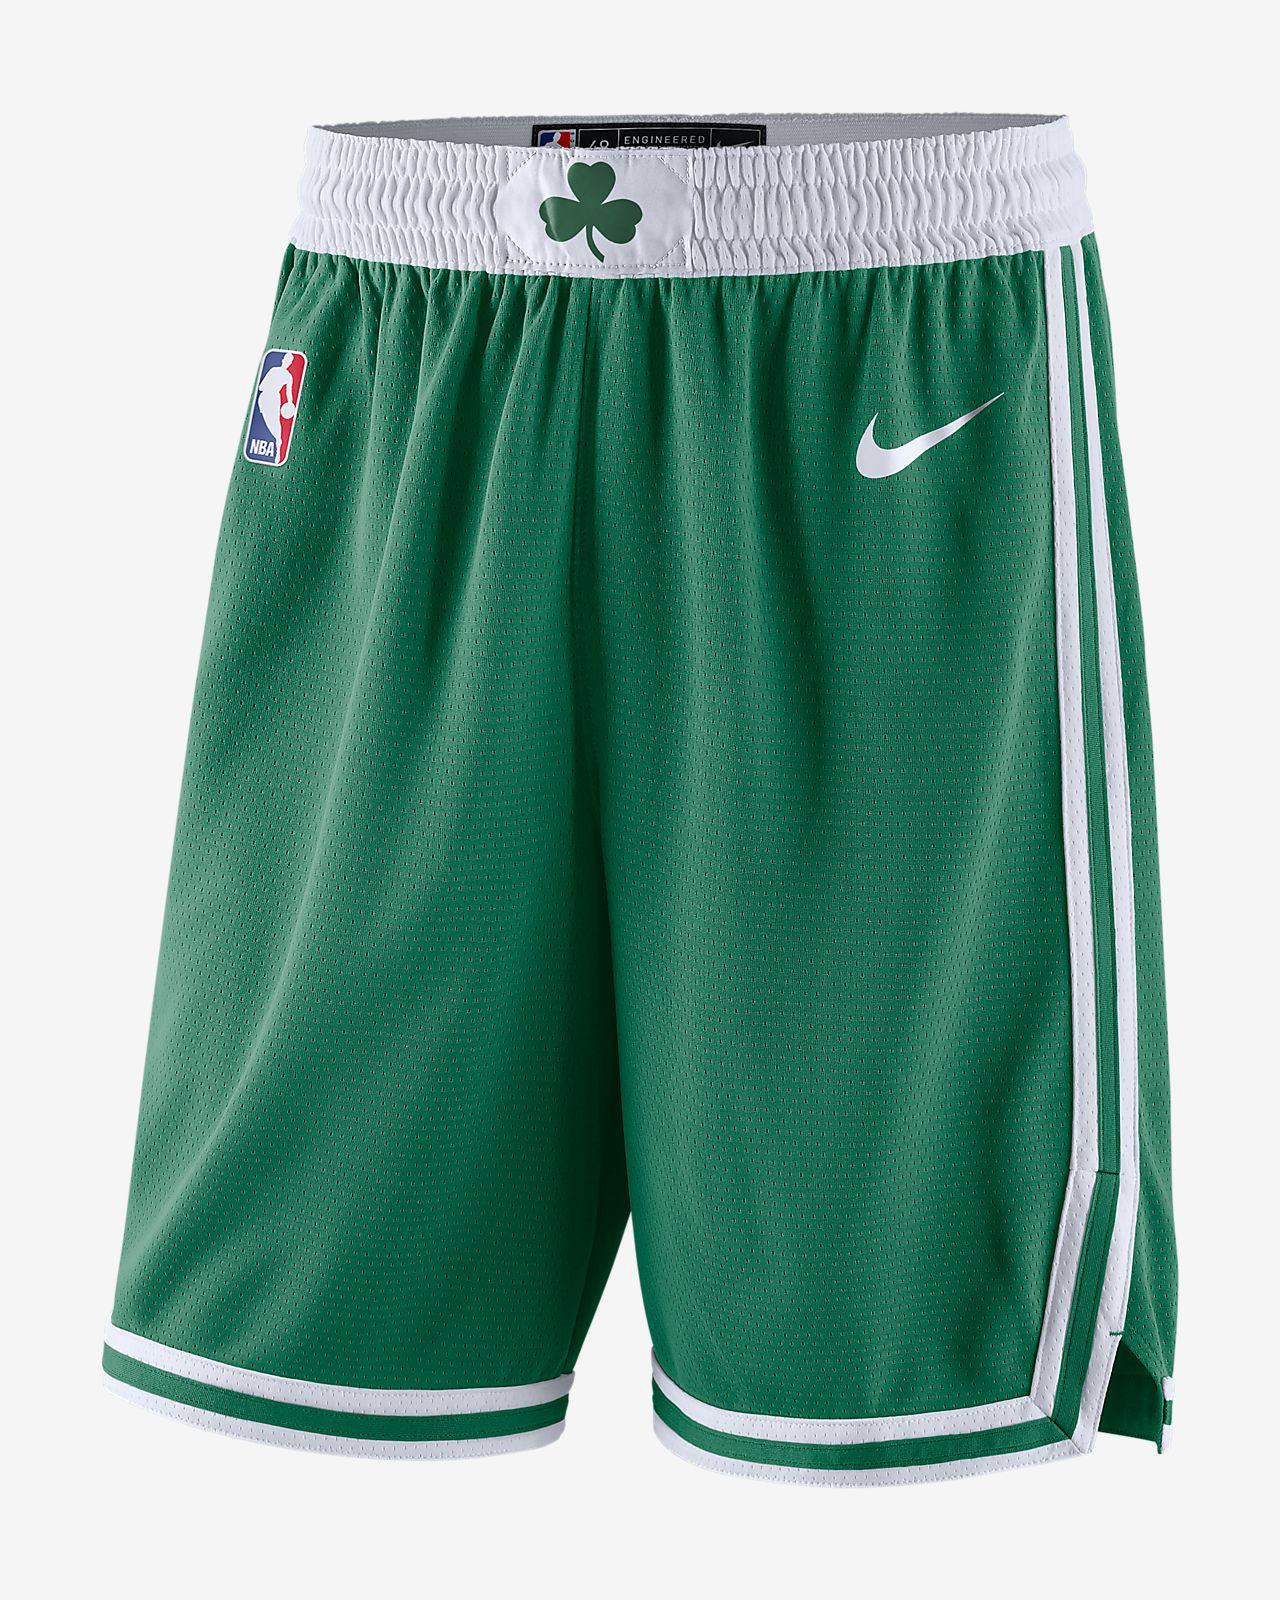 Shorts Nike de la NBA para hombre Boston Celtics Icon Edition Swingman